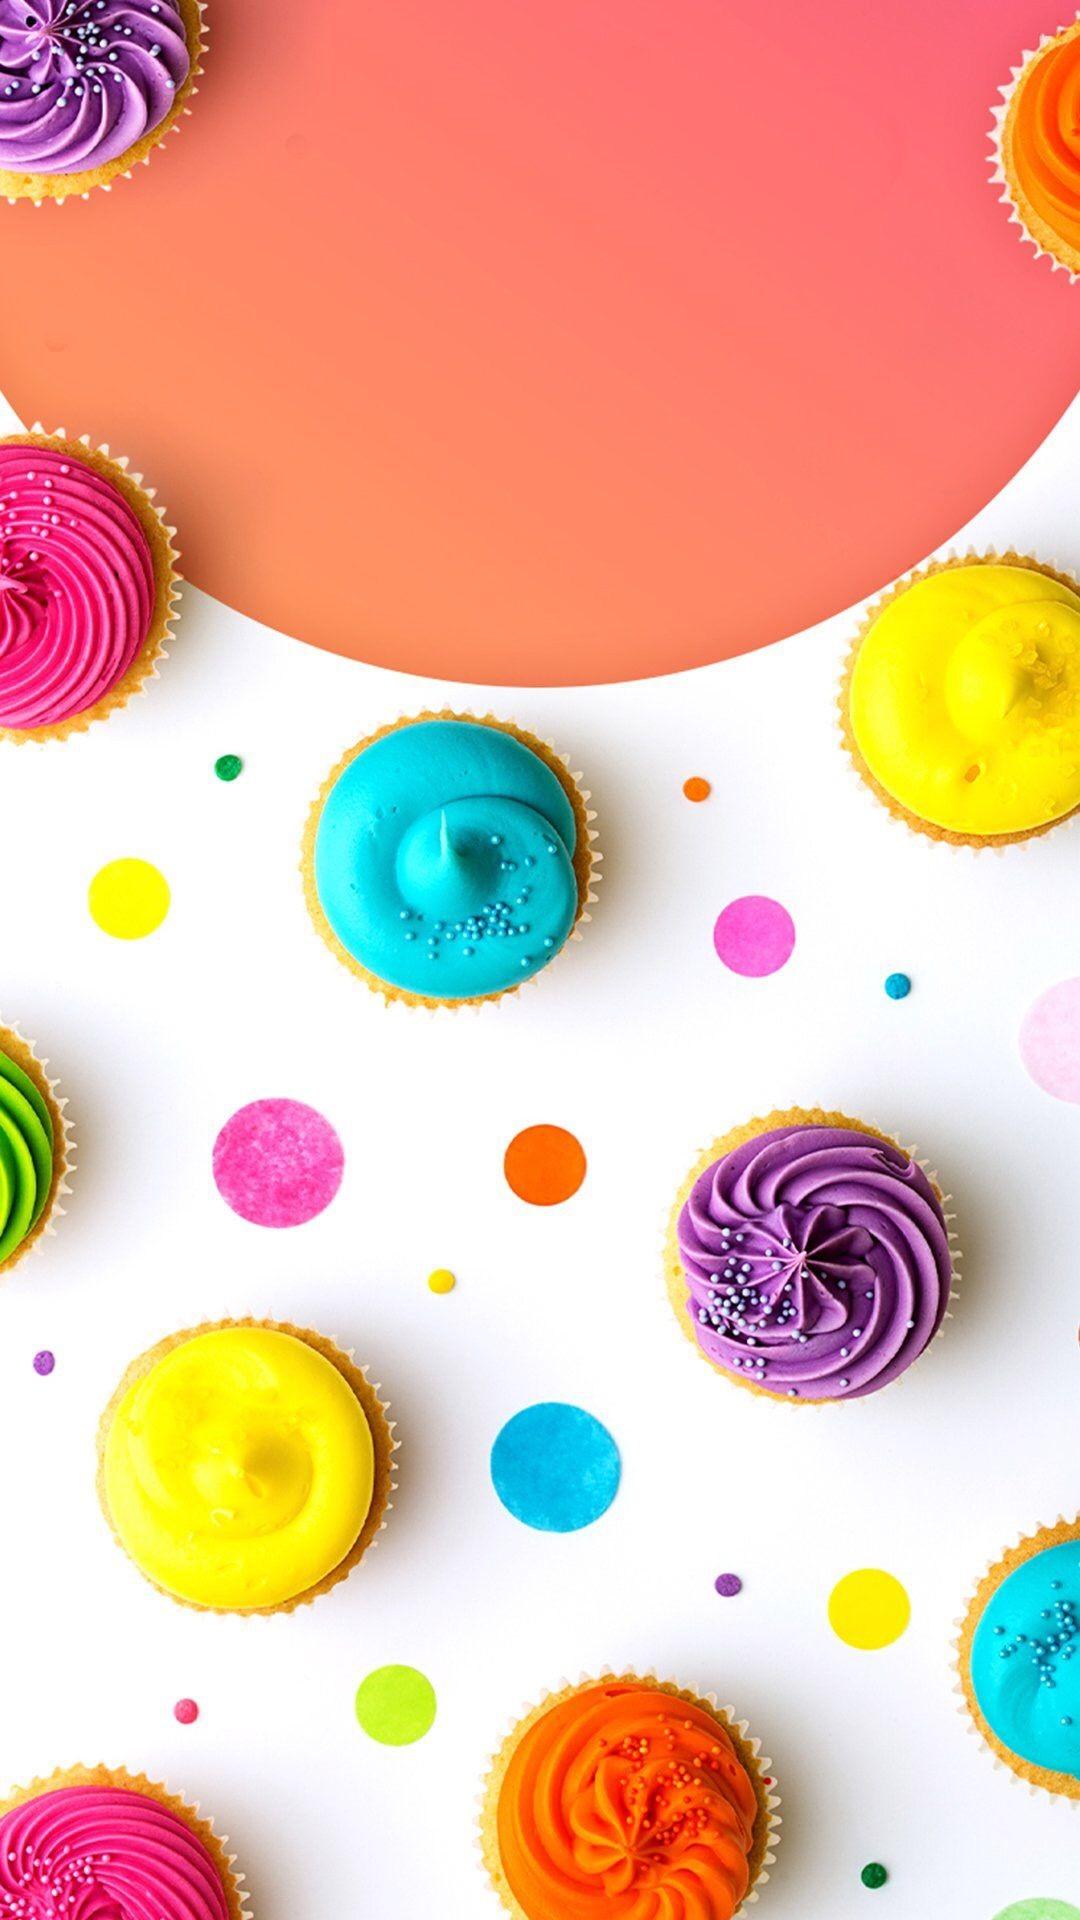 Res: 1080x1920, Food Wallpaper, Colorful Wallpaper, Wallpaper Backgrounds, Iphone Wallpapers,  Lock Screens, Wallpaper Patterns, Iphone 6, Bon Appetit, Smartphone